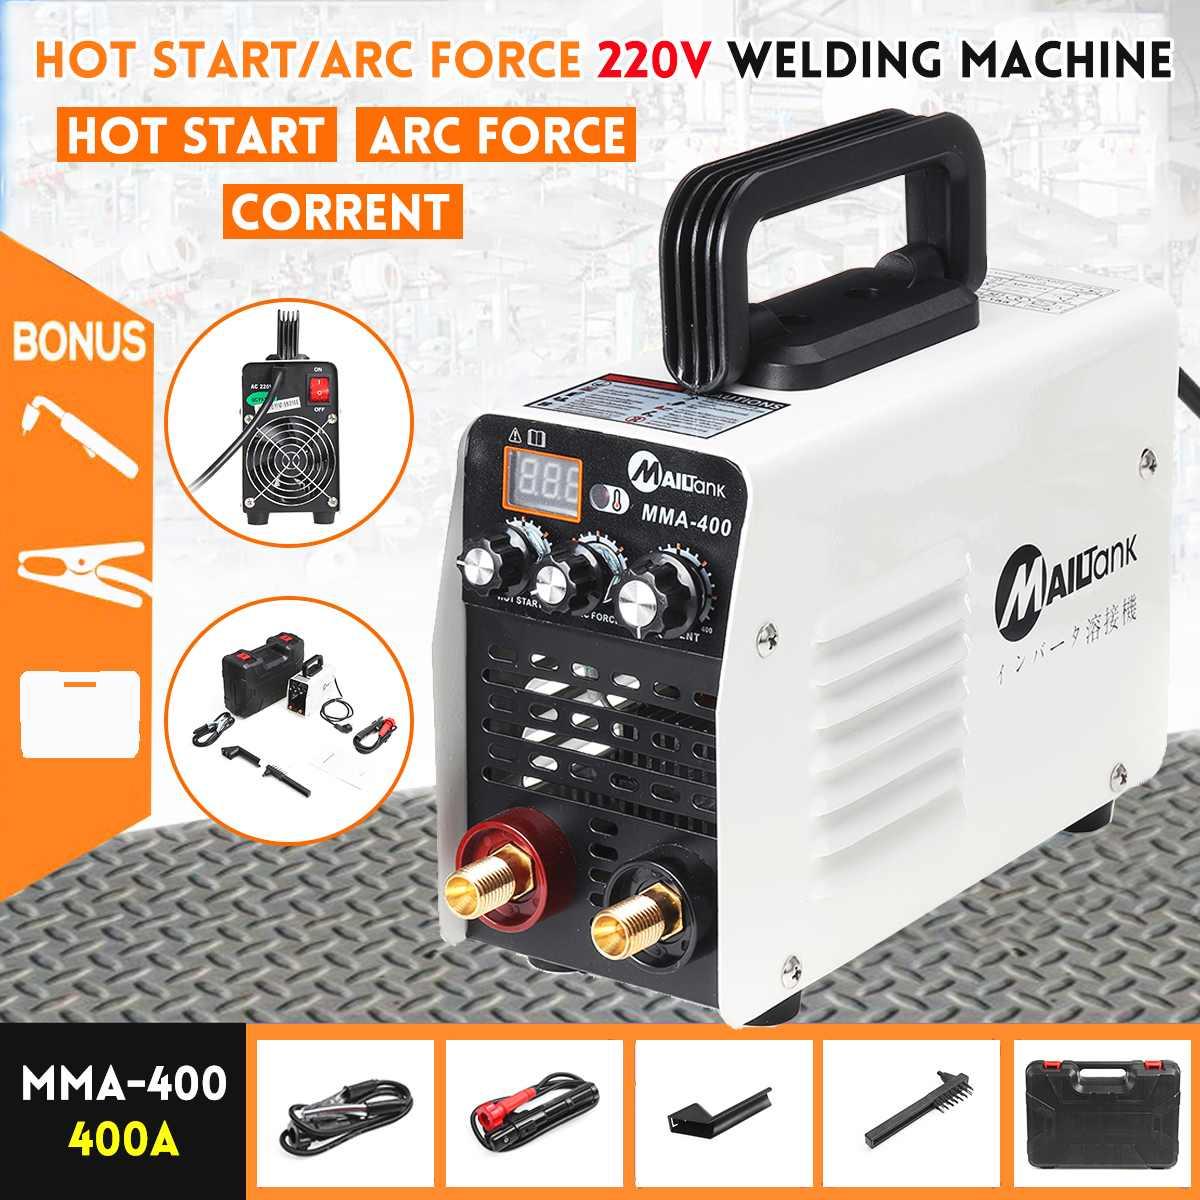 Mini IGBT Inverter Digital Hot Start MMA 220V Arc Welder Welding Machine Tools Welding Working Accessories Electric Power Tools